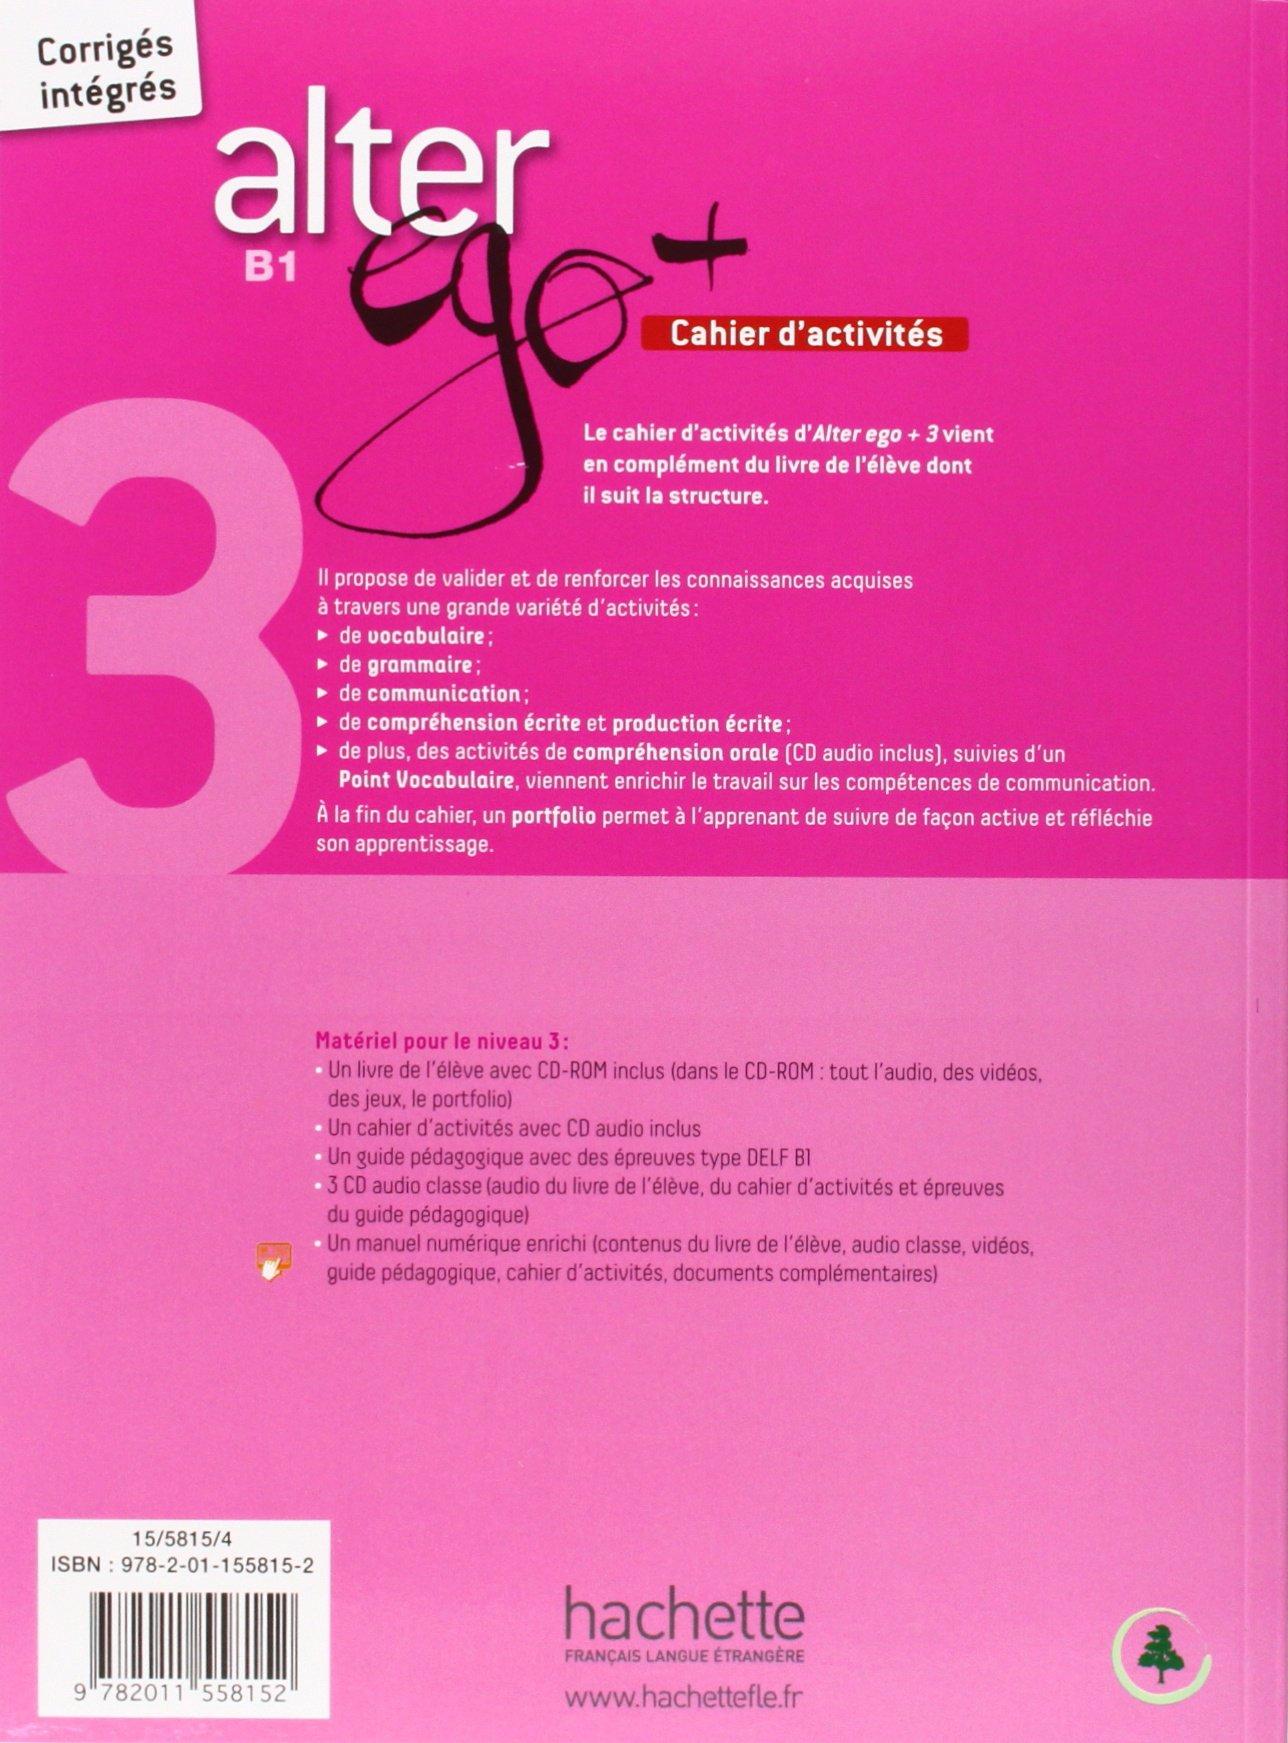 2 alter activites plus pdf cahier d ego